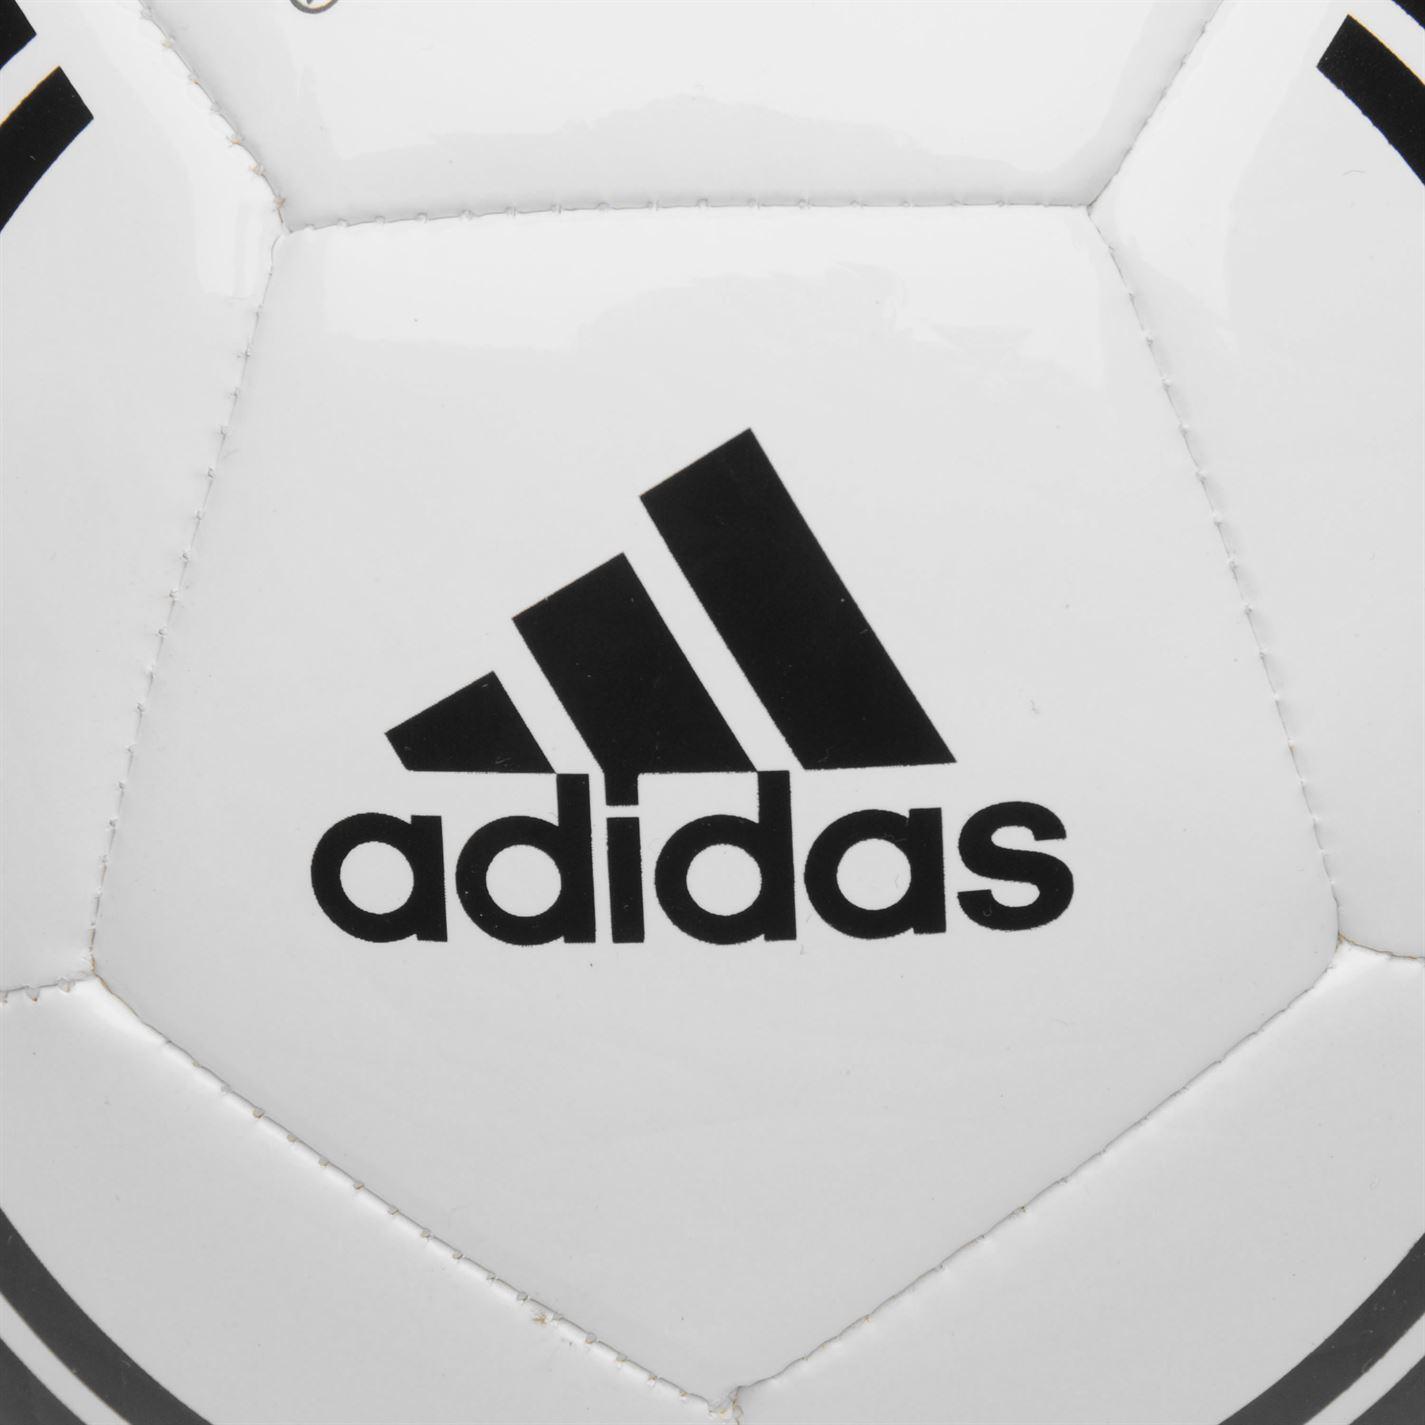 ... adidas Tango Glider Football White Black Soccer Ball 7802314ecd6e0